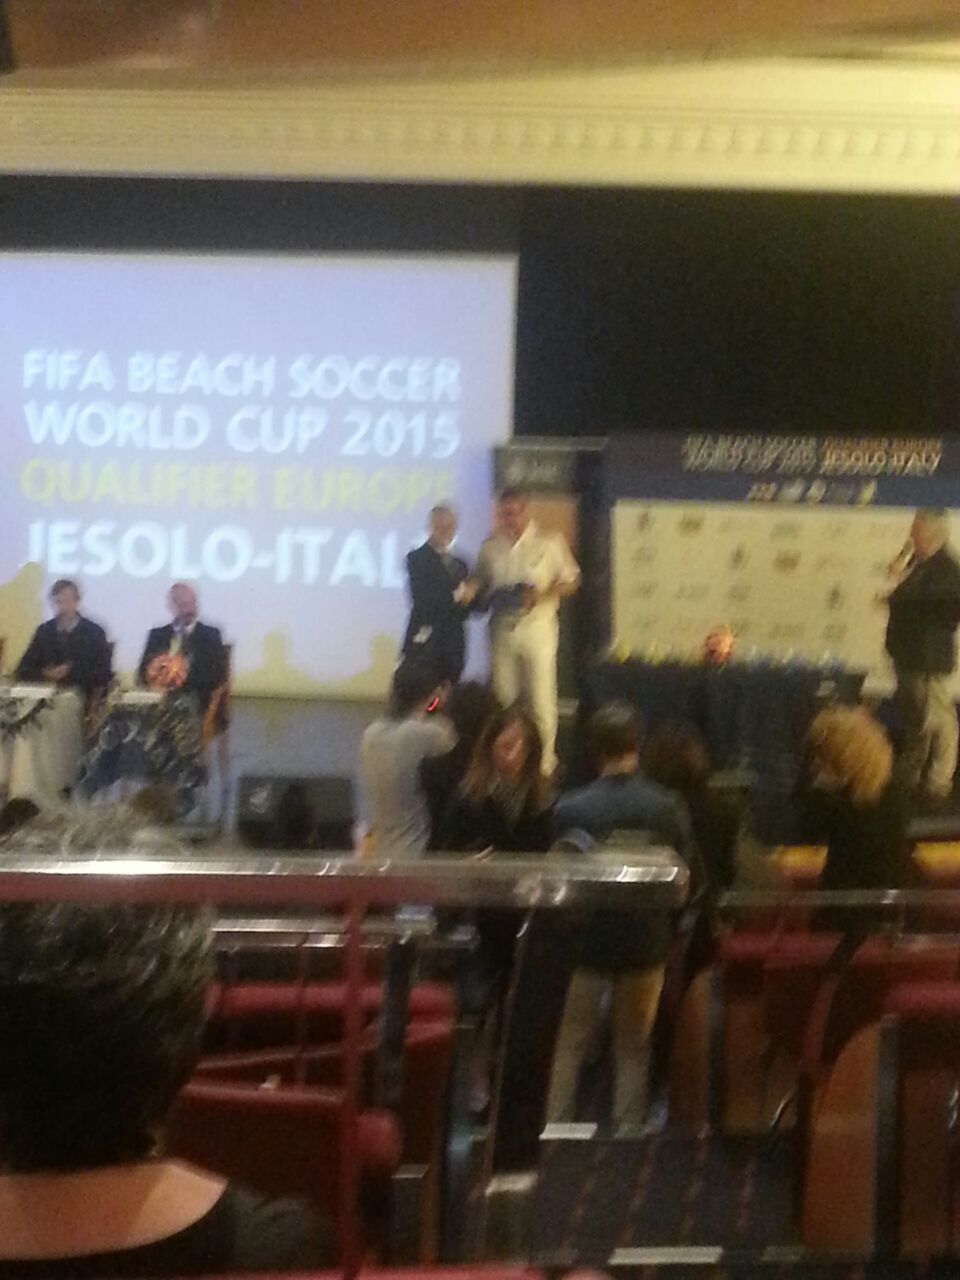 18/7/14 MSC Armonia -  Evento Fifa Beach soccer world cup-diretta-liveboat-msc-armonia-fifa-event-9-jpg